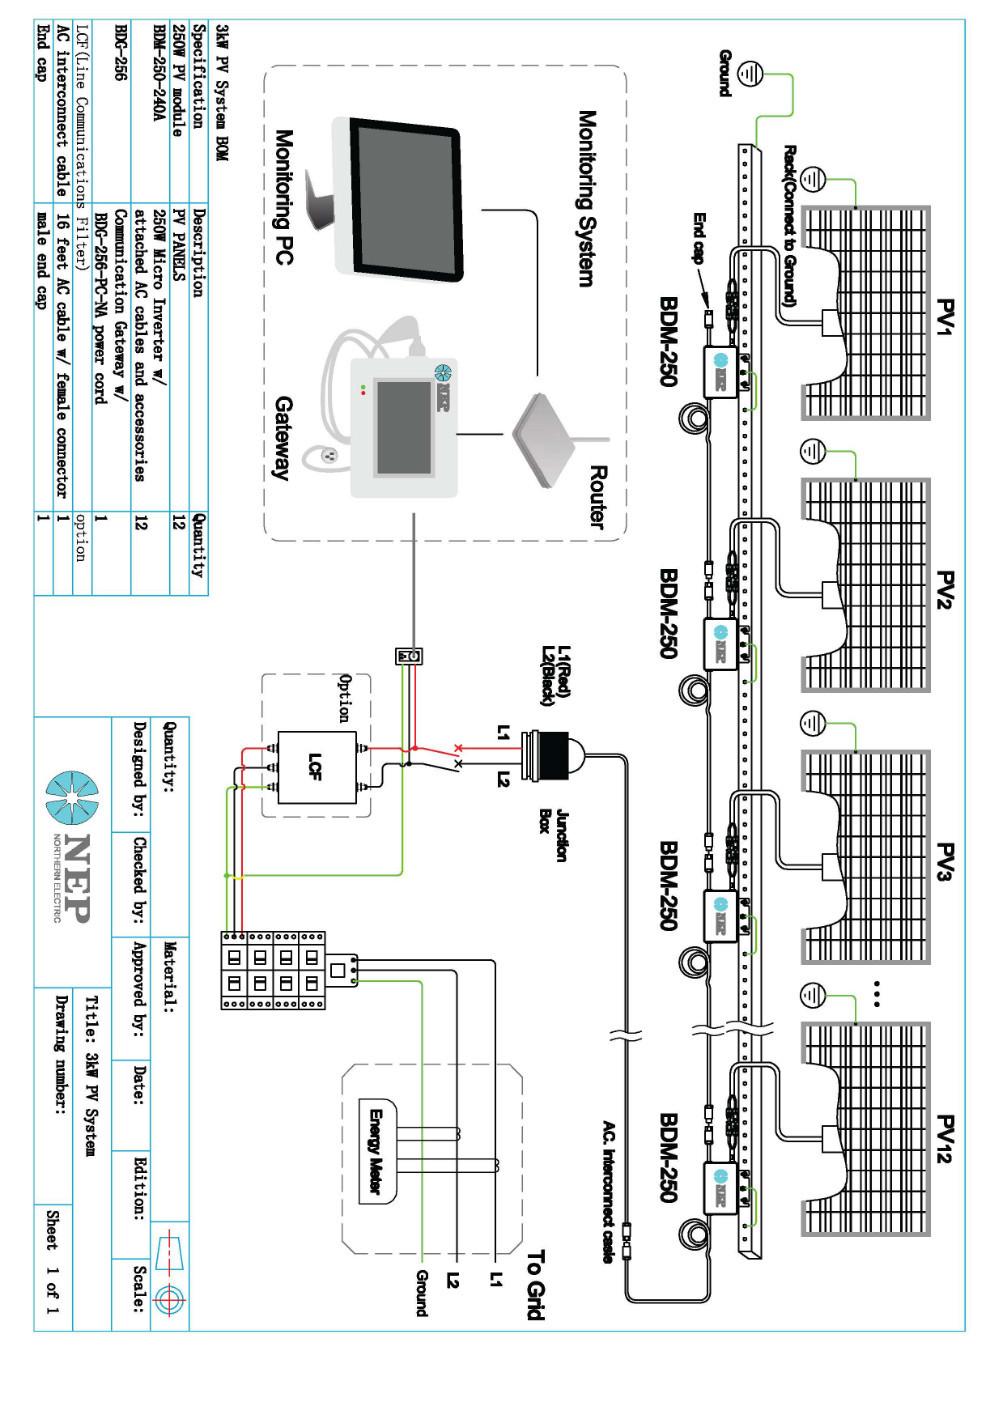 500w Grid Tie Solar Wiring Diagram Auto Electrical Of A Power System